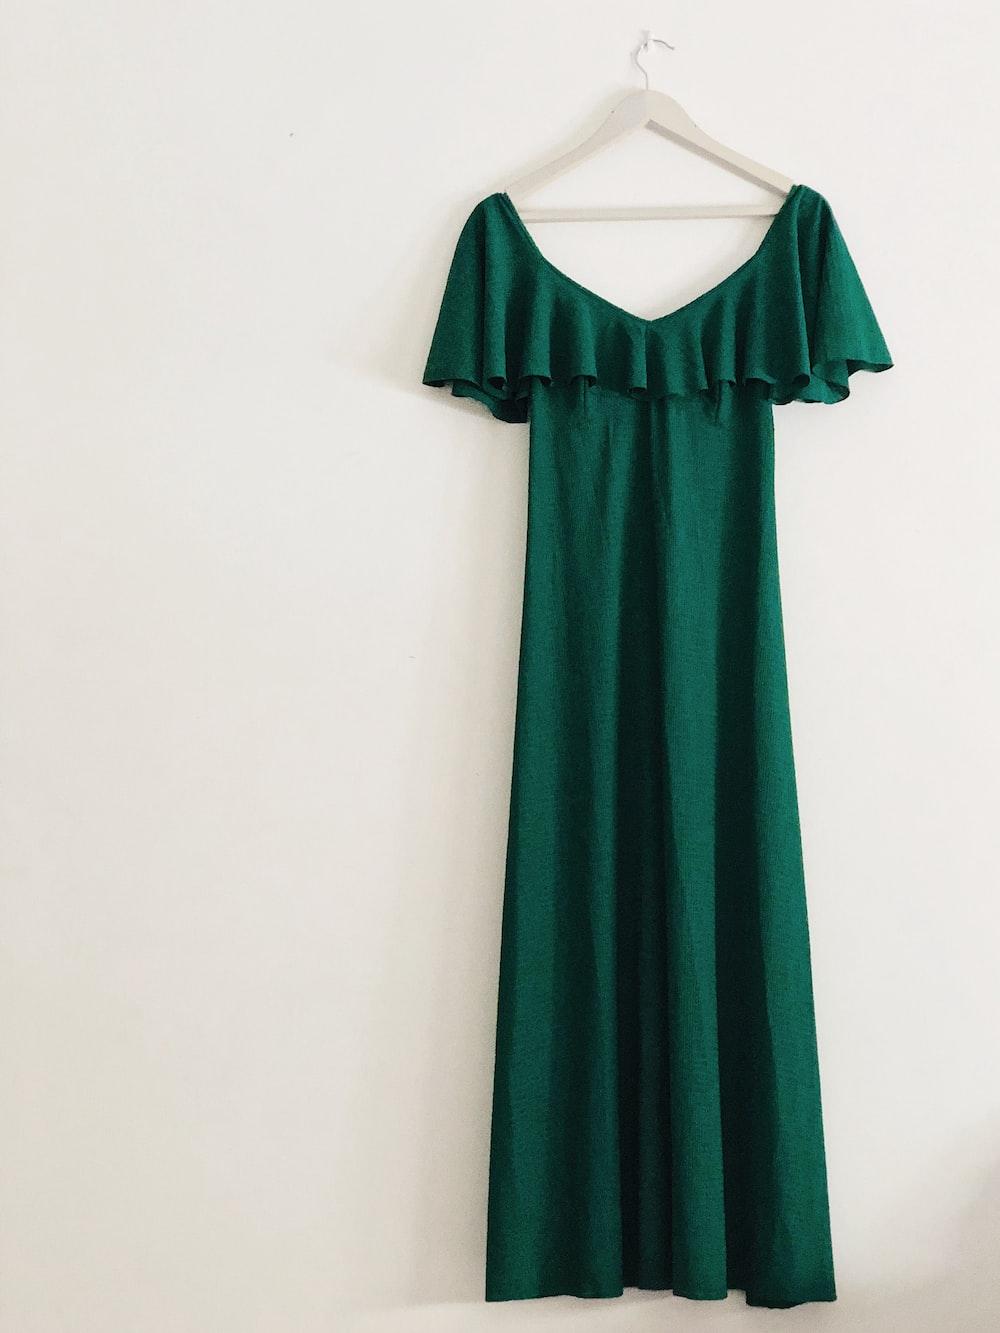 green sleeveless dress hanged on white wall